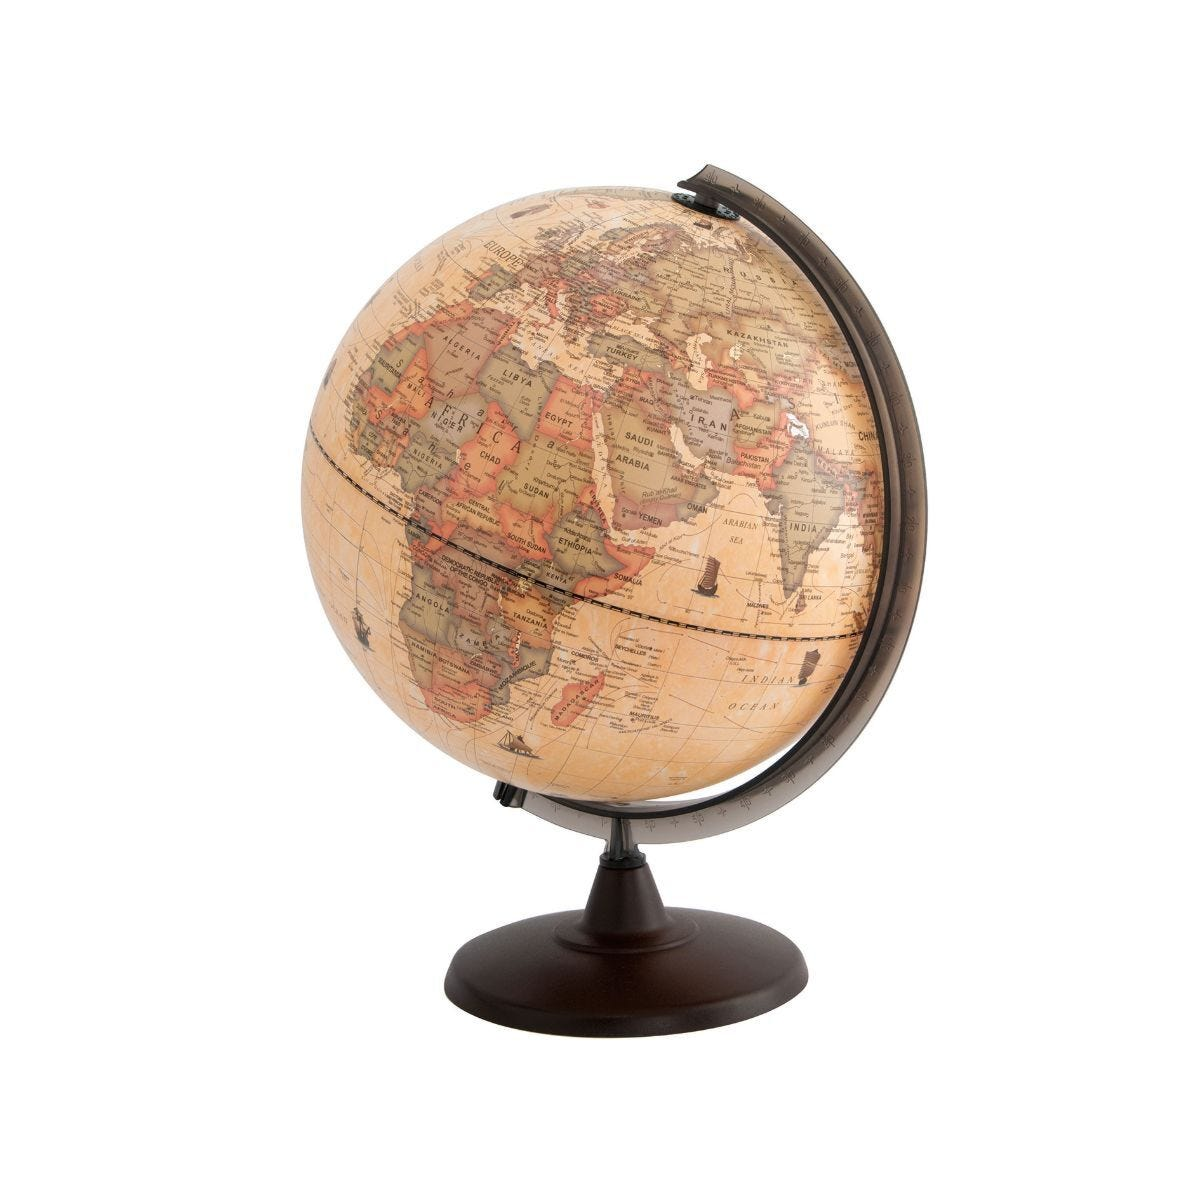 Ryman Illuminated Antique Effect Globe 30cm